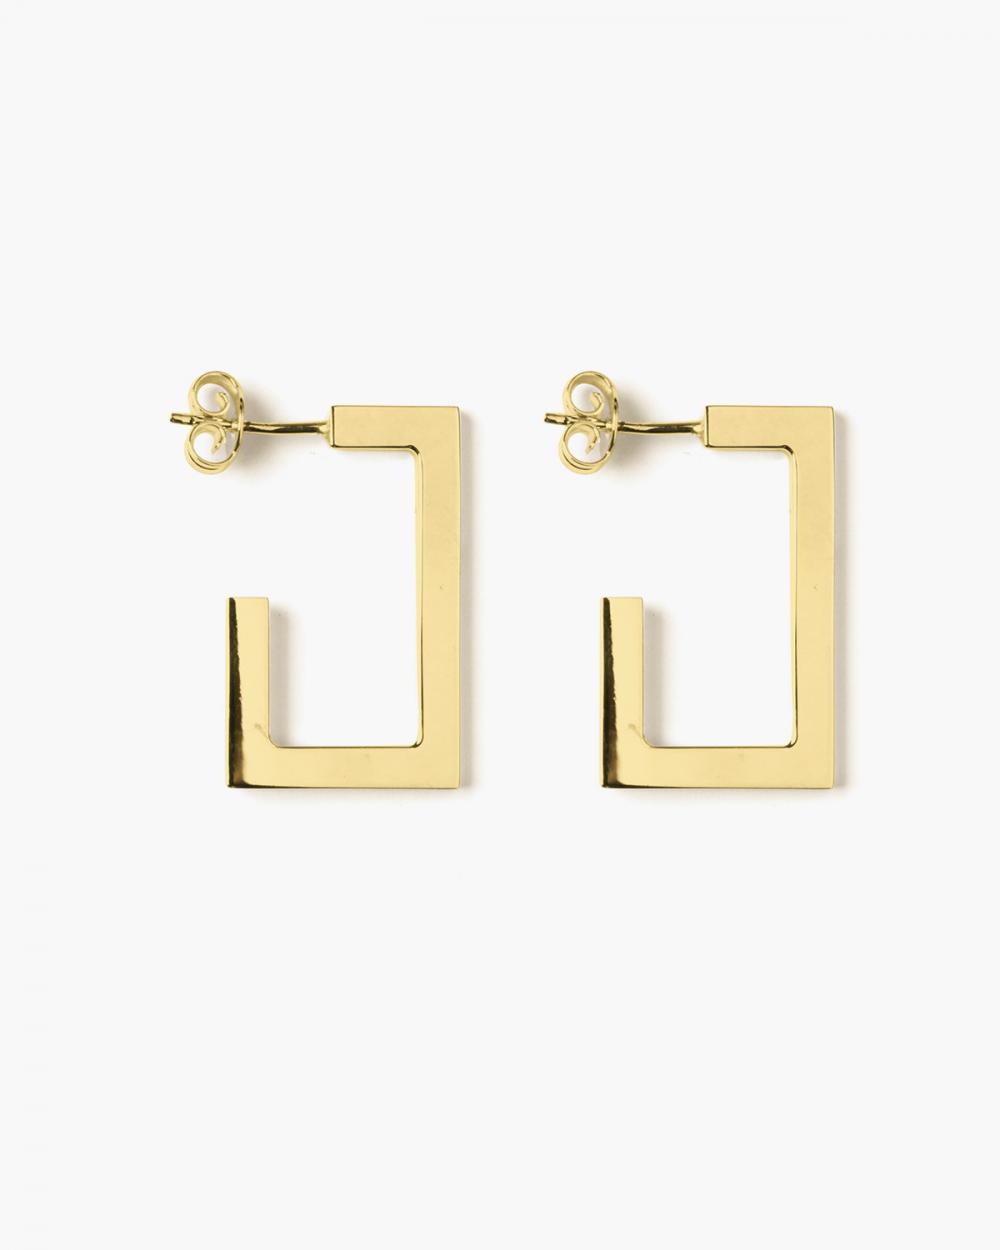 Earrings YELLOW GOLD RECTANGULAR PLATE BIG EARRINGS NOVE25